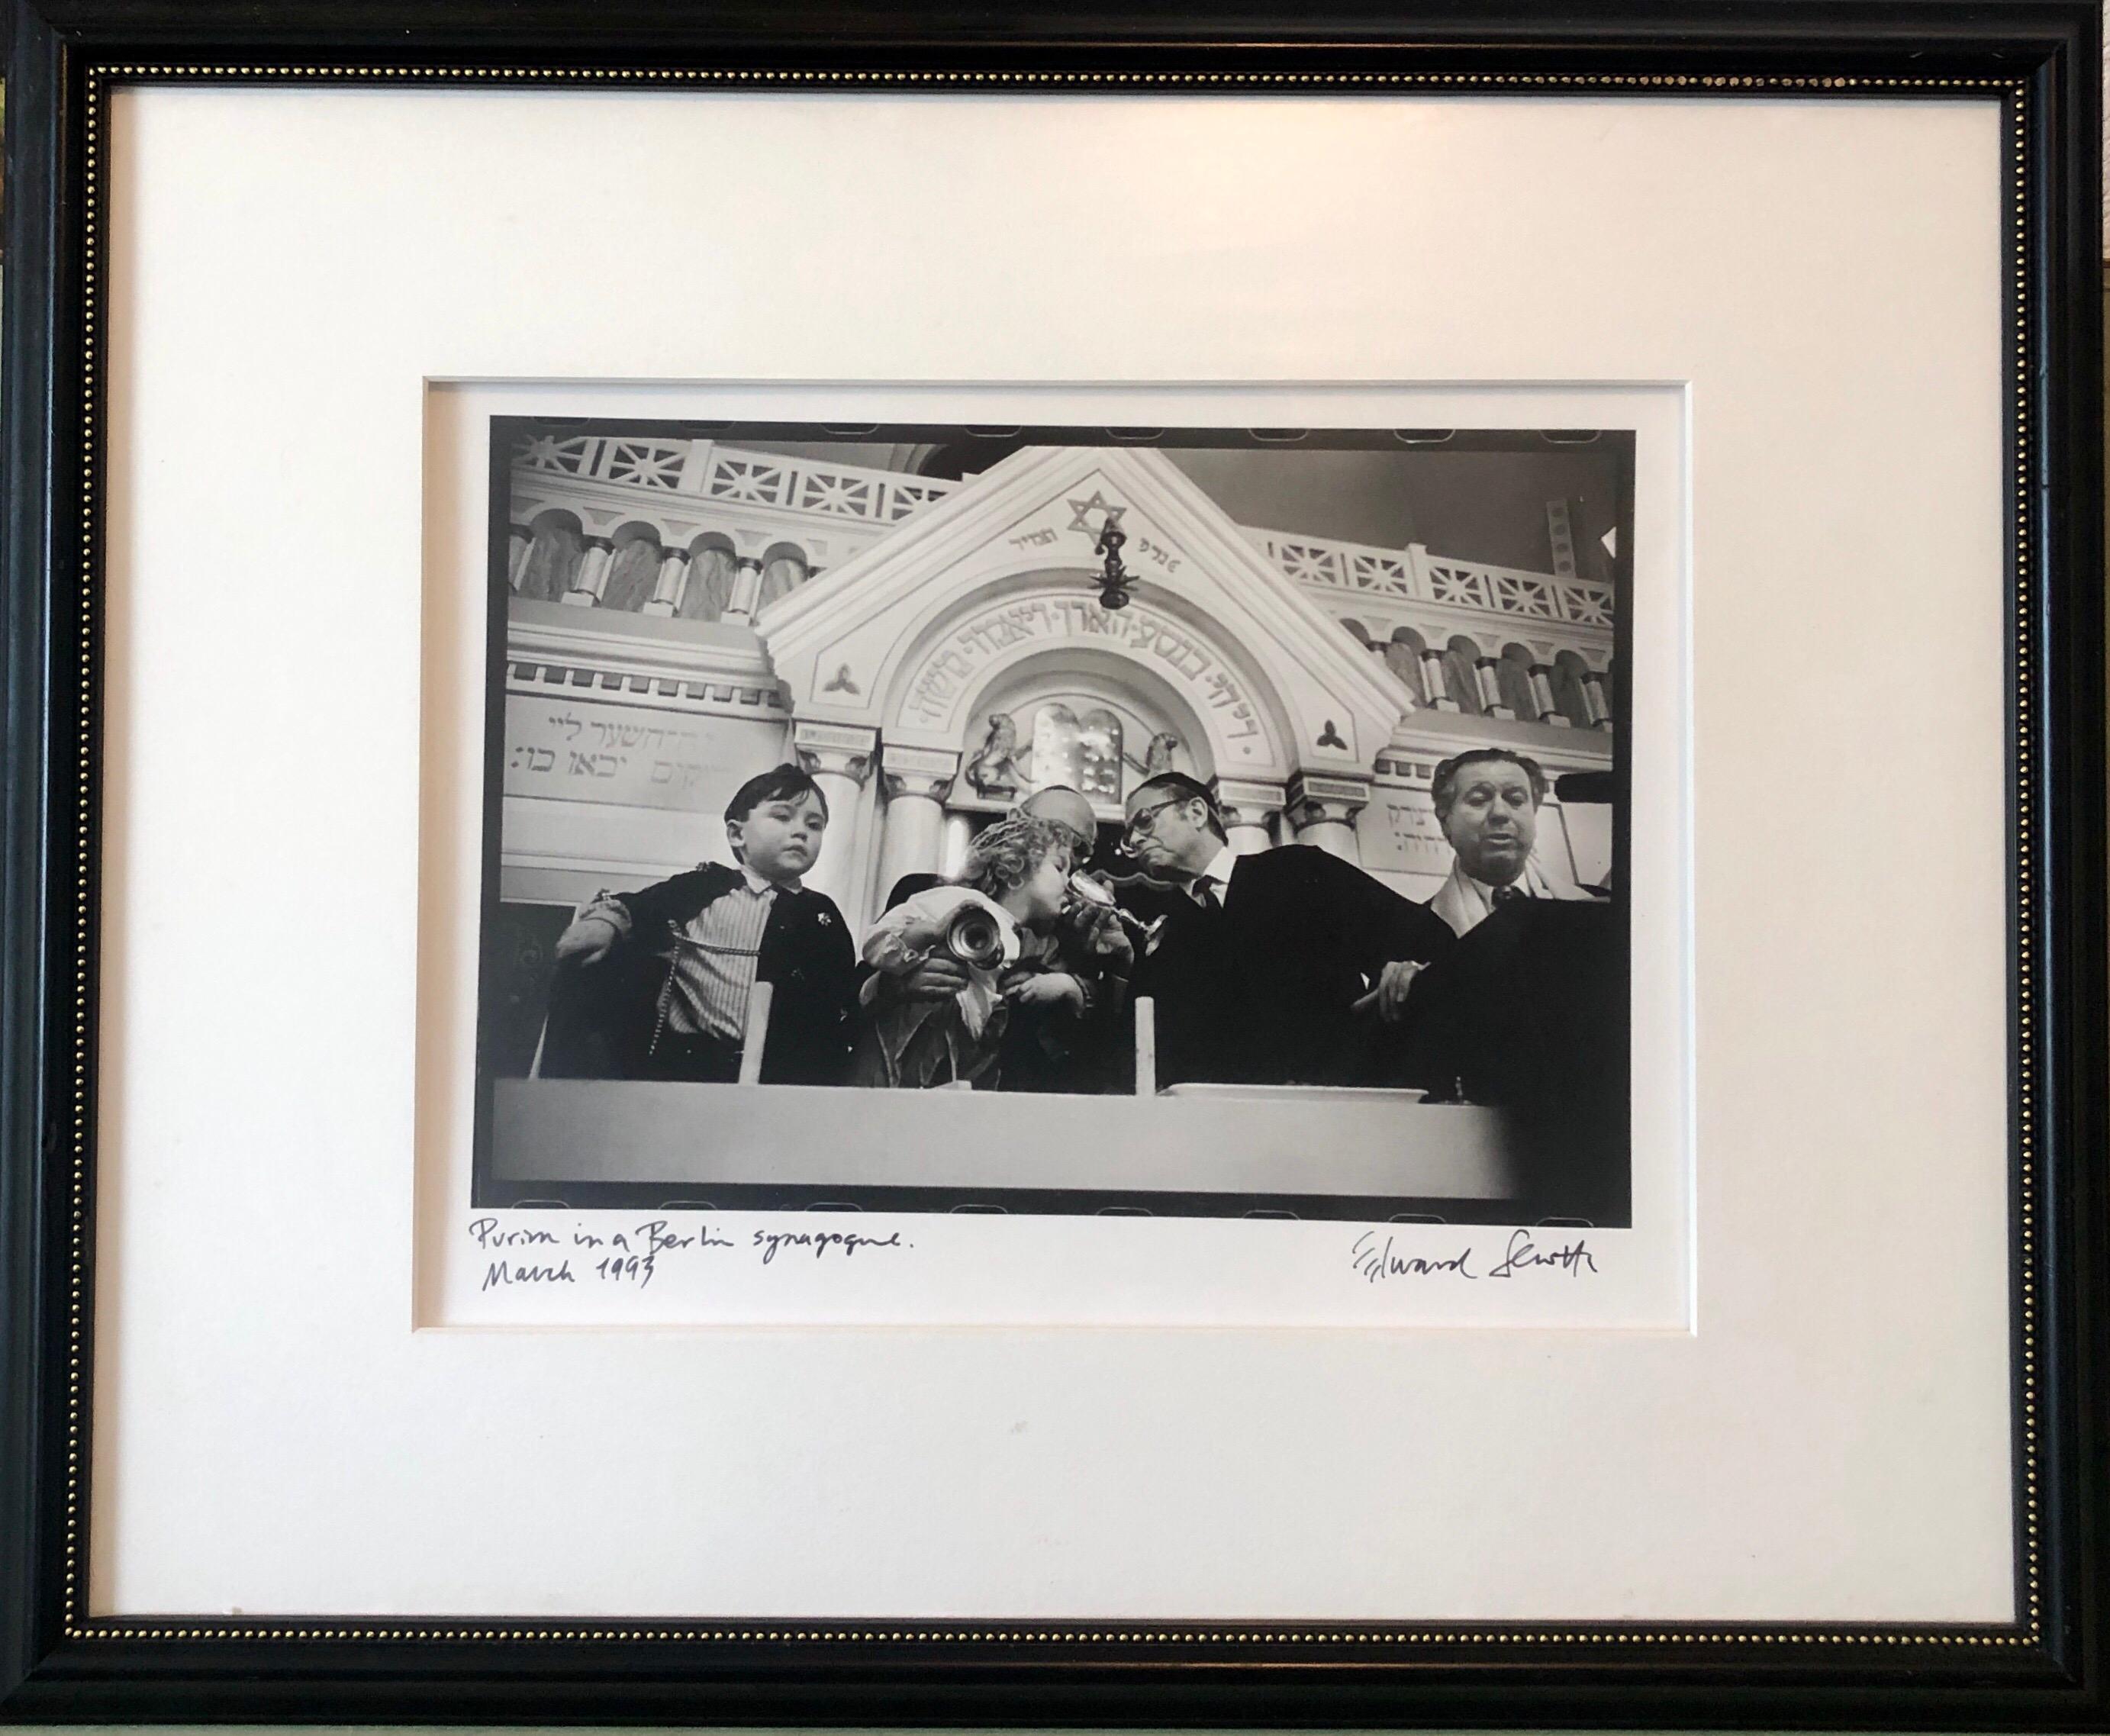 Photo Purim Pestalozzi Str Synagogue Berlin Vintage Silver Gelatin Photograph